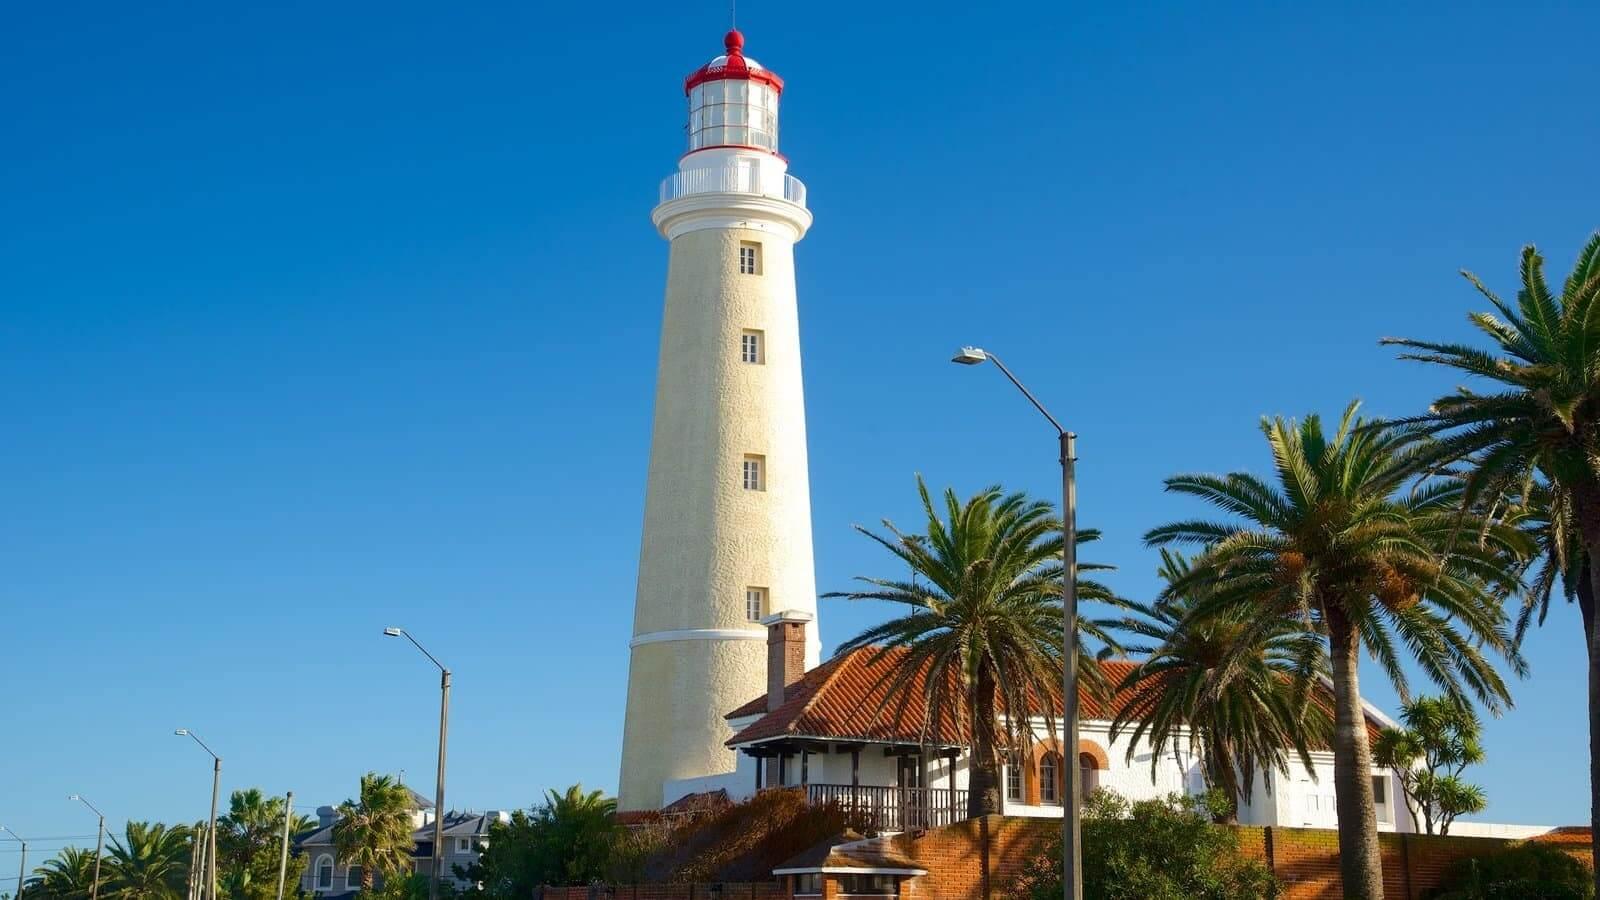 Passeios românticos em Punta del Este: Farol de Punta del Este